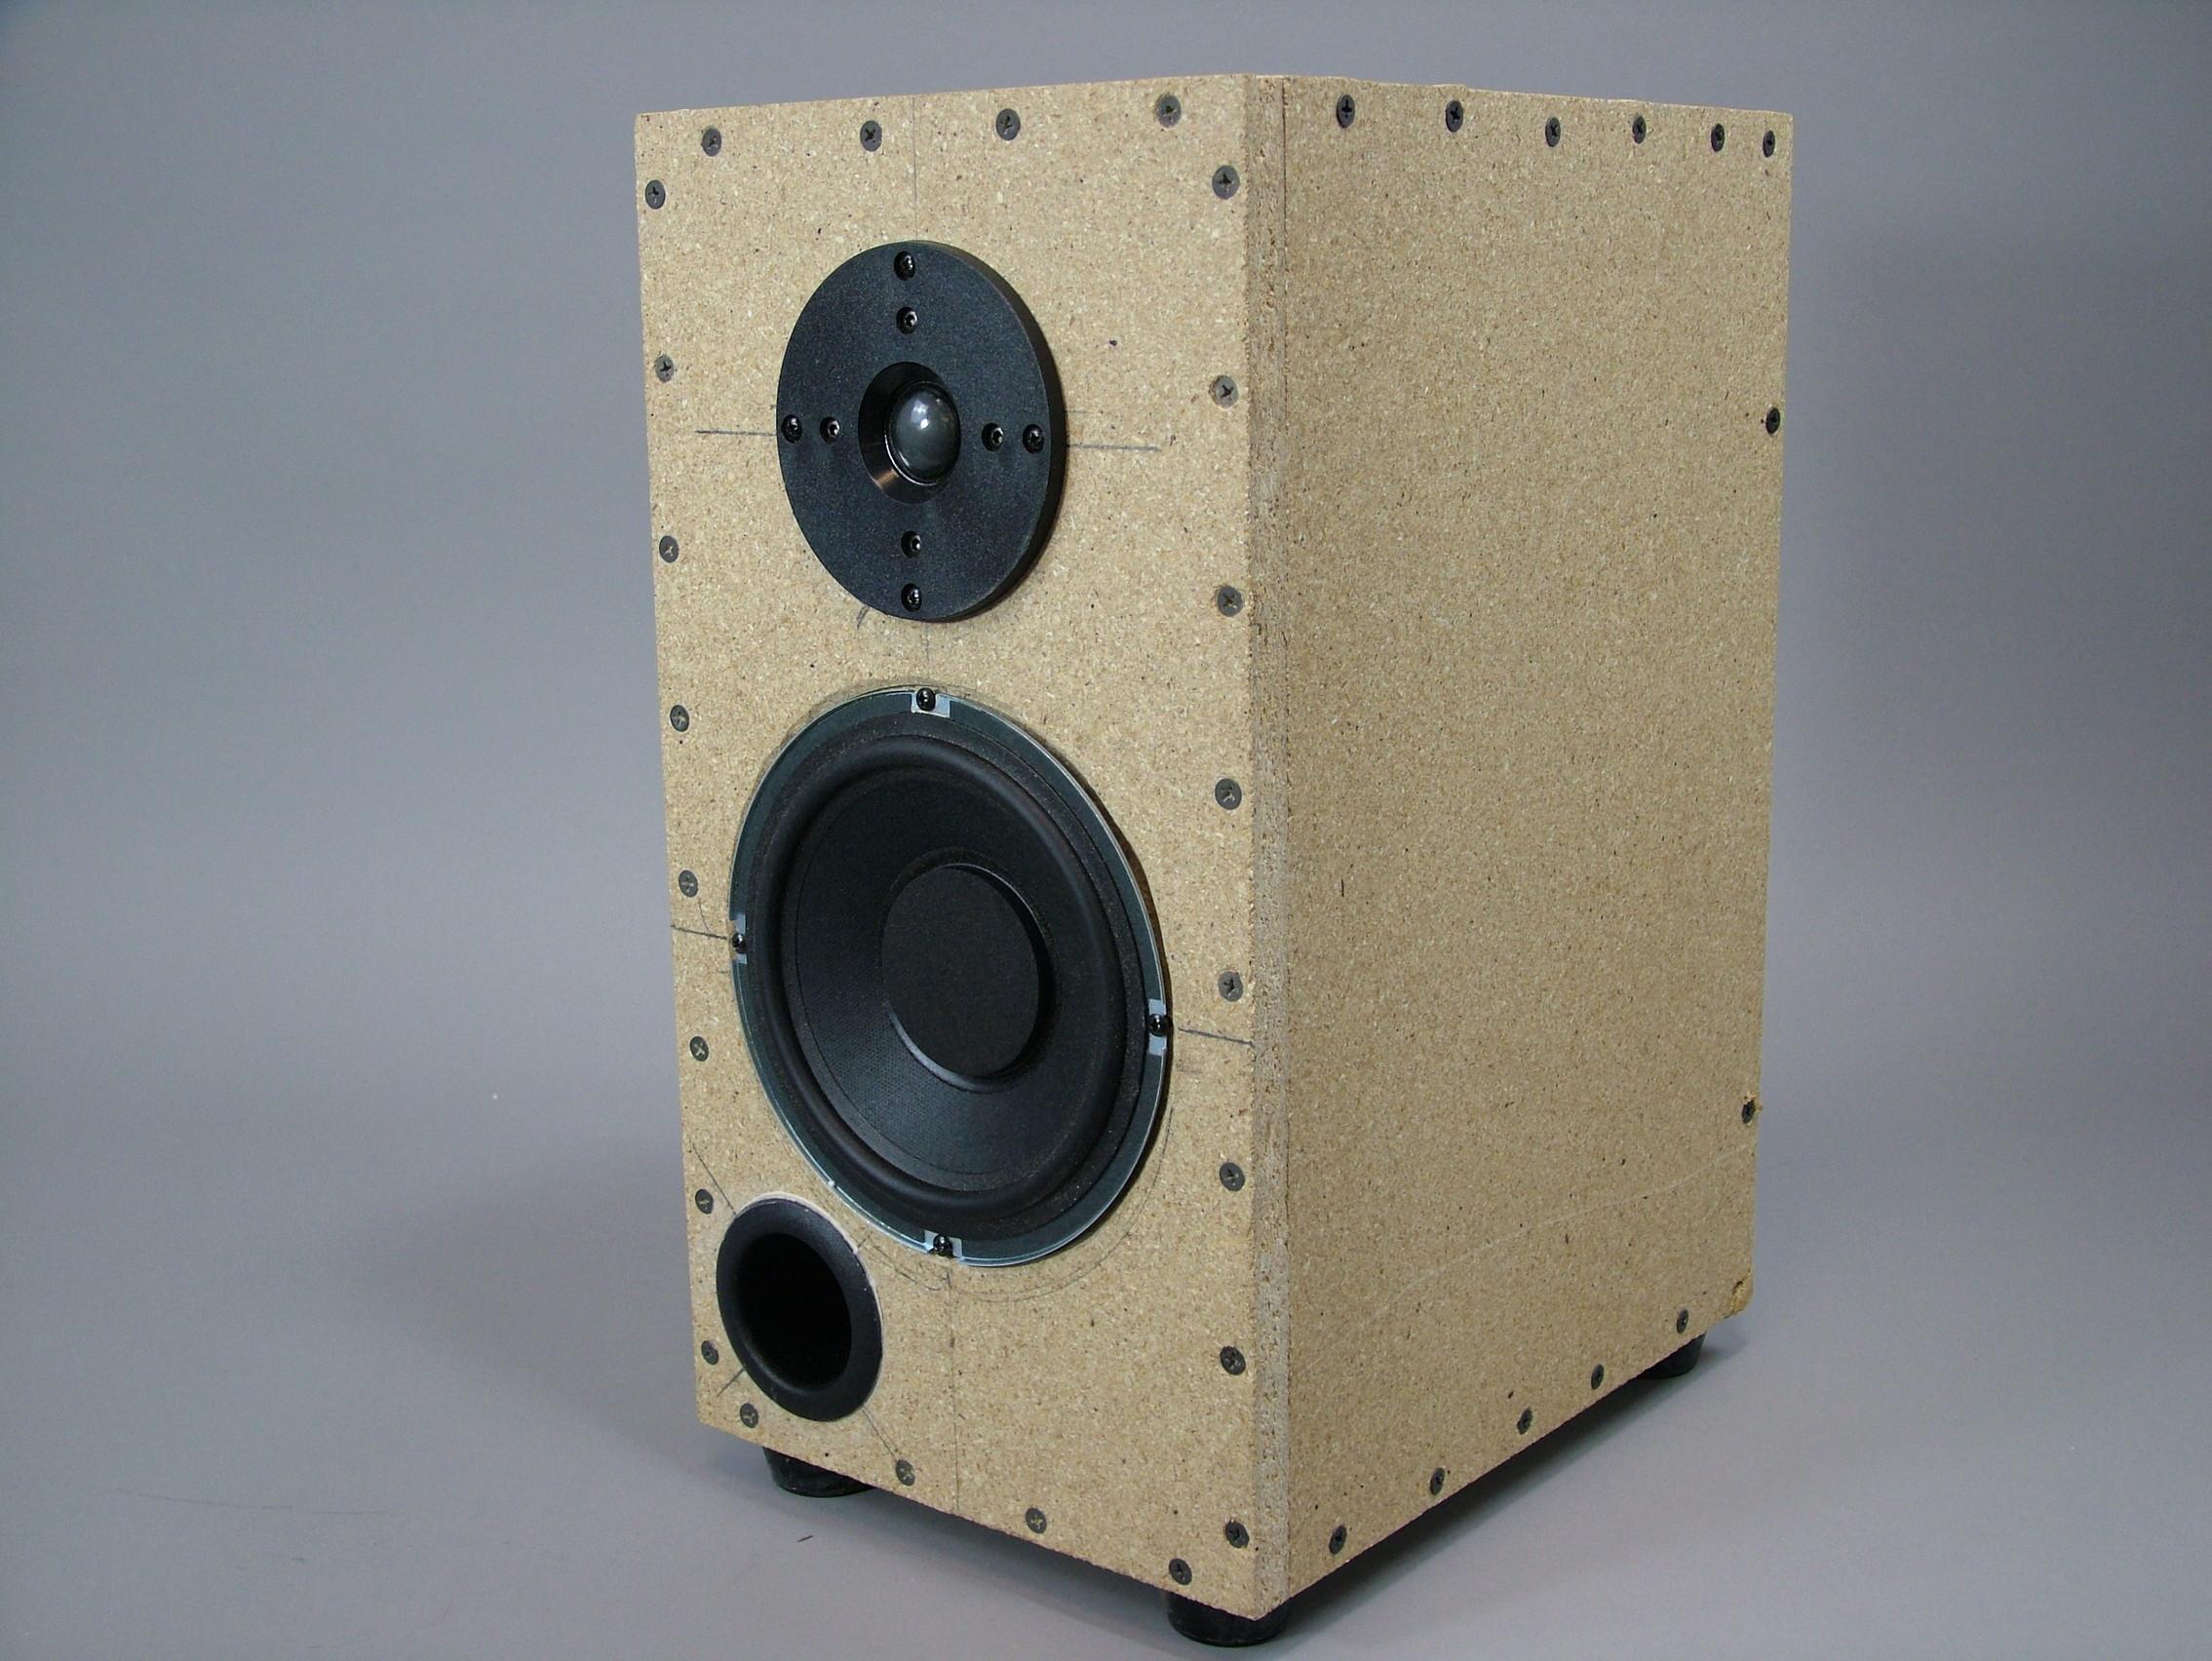 studio reference audiophile monitor 6 5 kit components plans 8 ohm 125 watts ebay. Black Bedroom Furniture Sets. Home Design Ideas